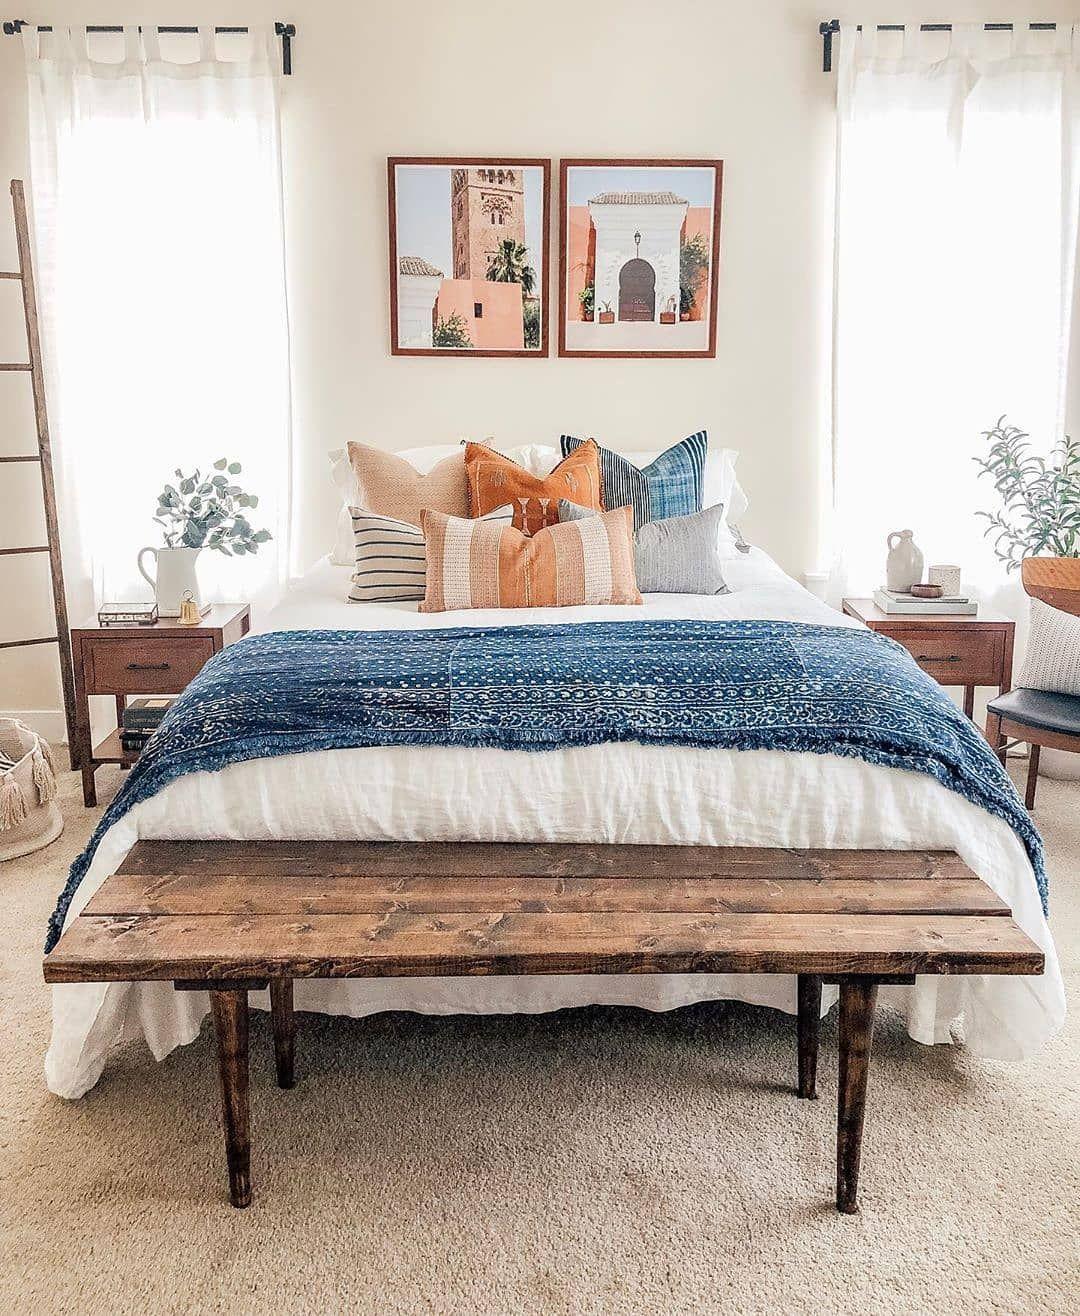 "Bohemian Home Decor on Instagram: ""Via: 💗@BIDathome 💗 what do you think? . Follow us for more @BIDathome . . . . Credits: @collectivco #decoration #decor #bohodecor…"""